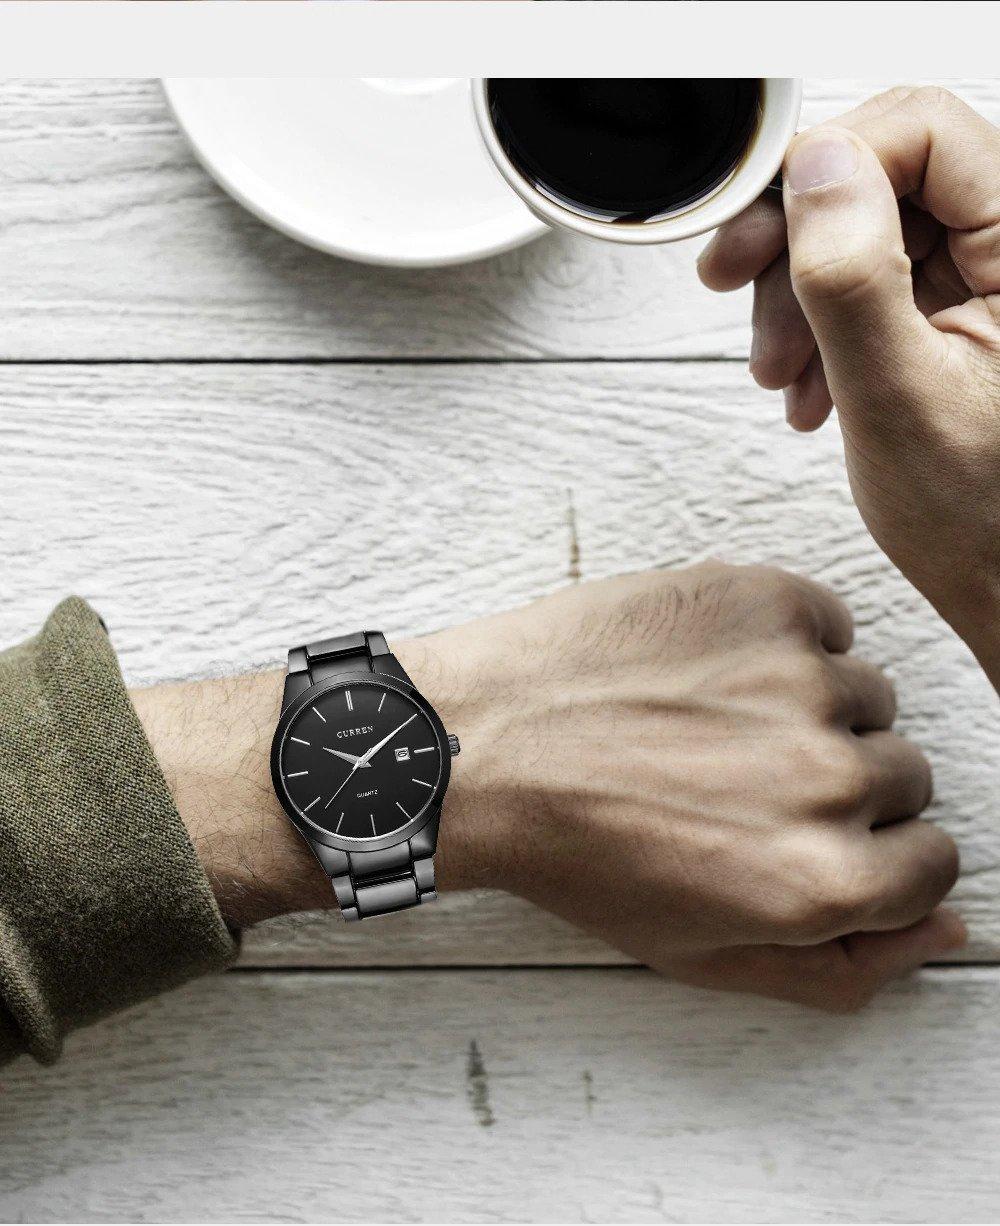 Zegarek Curren Classic czarny 7